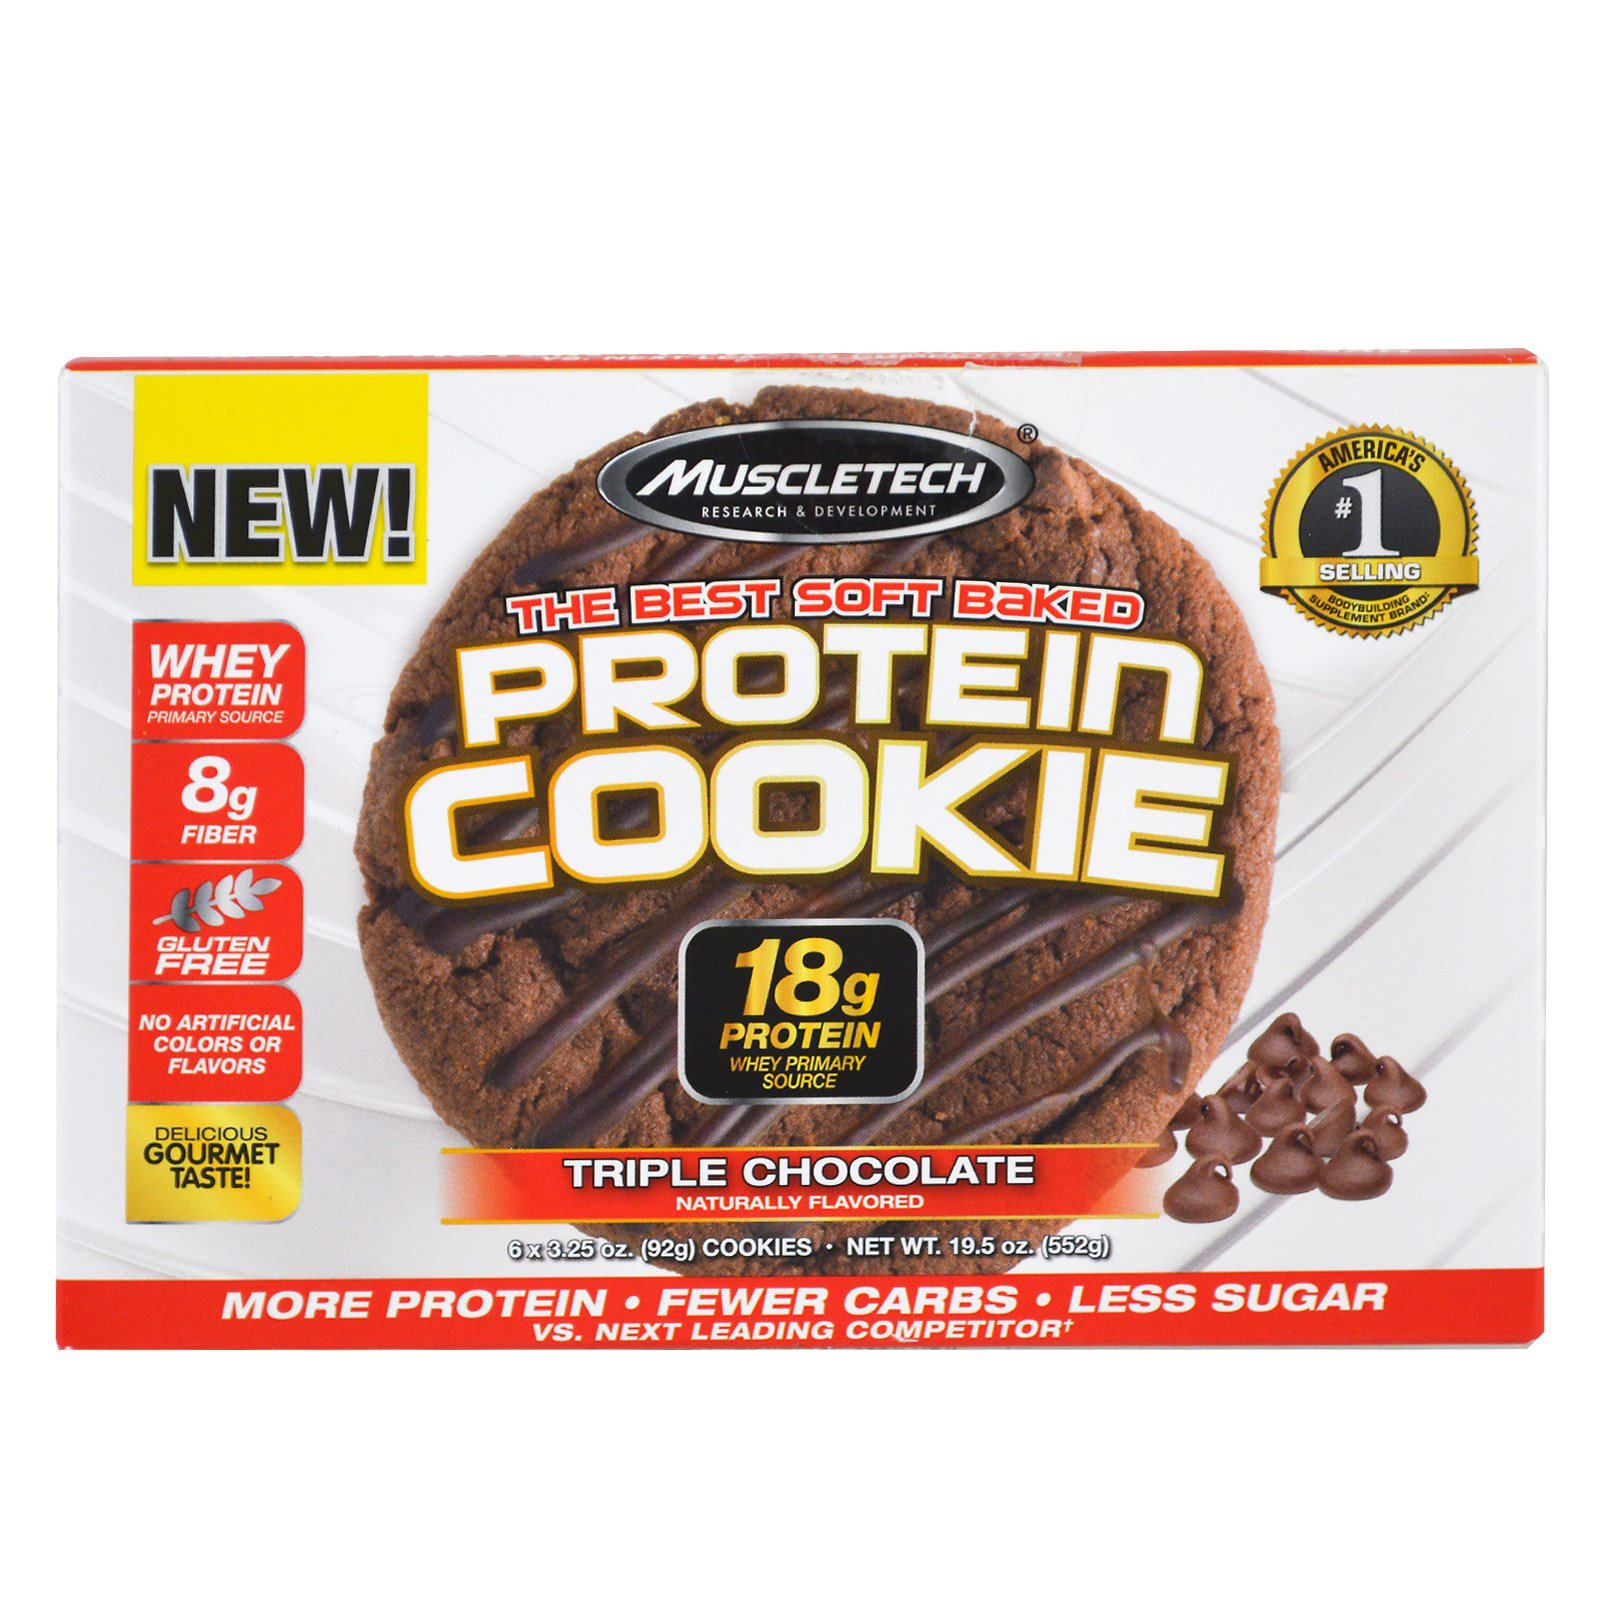 Muscletech, Best Soft Baked Protein Cookie (мягкое печенье с протеином), тройной слой шоколада, 6 шт по 92 г